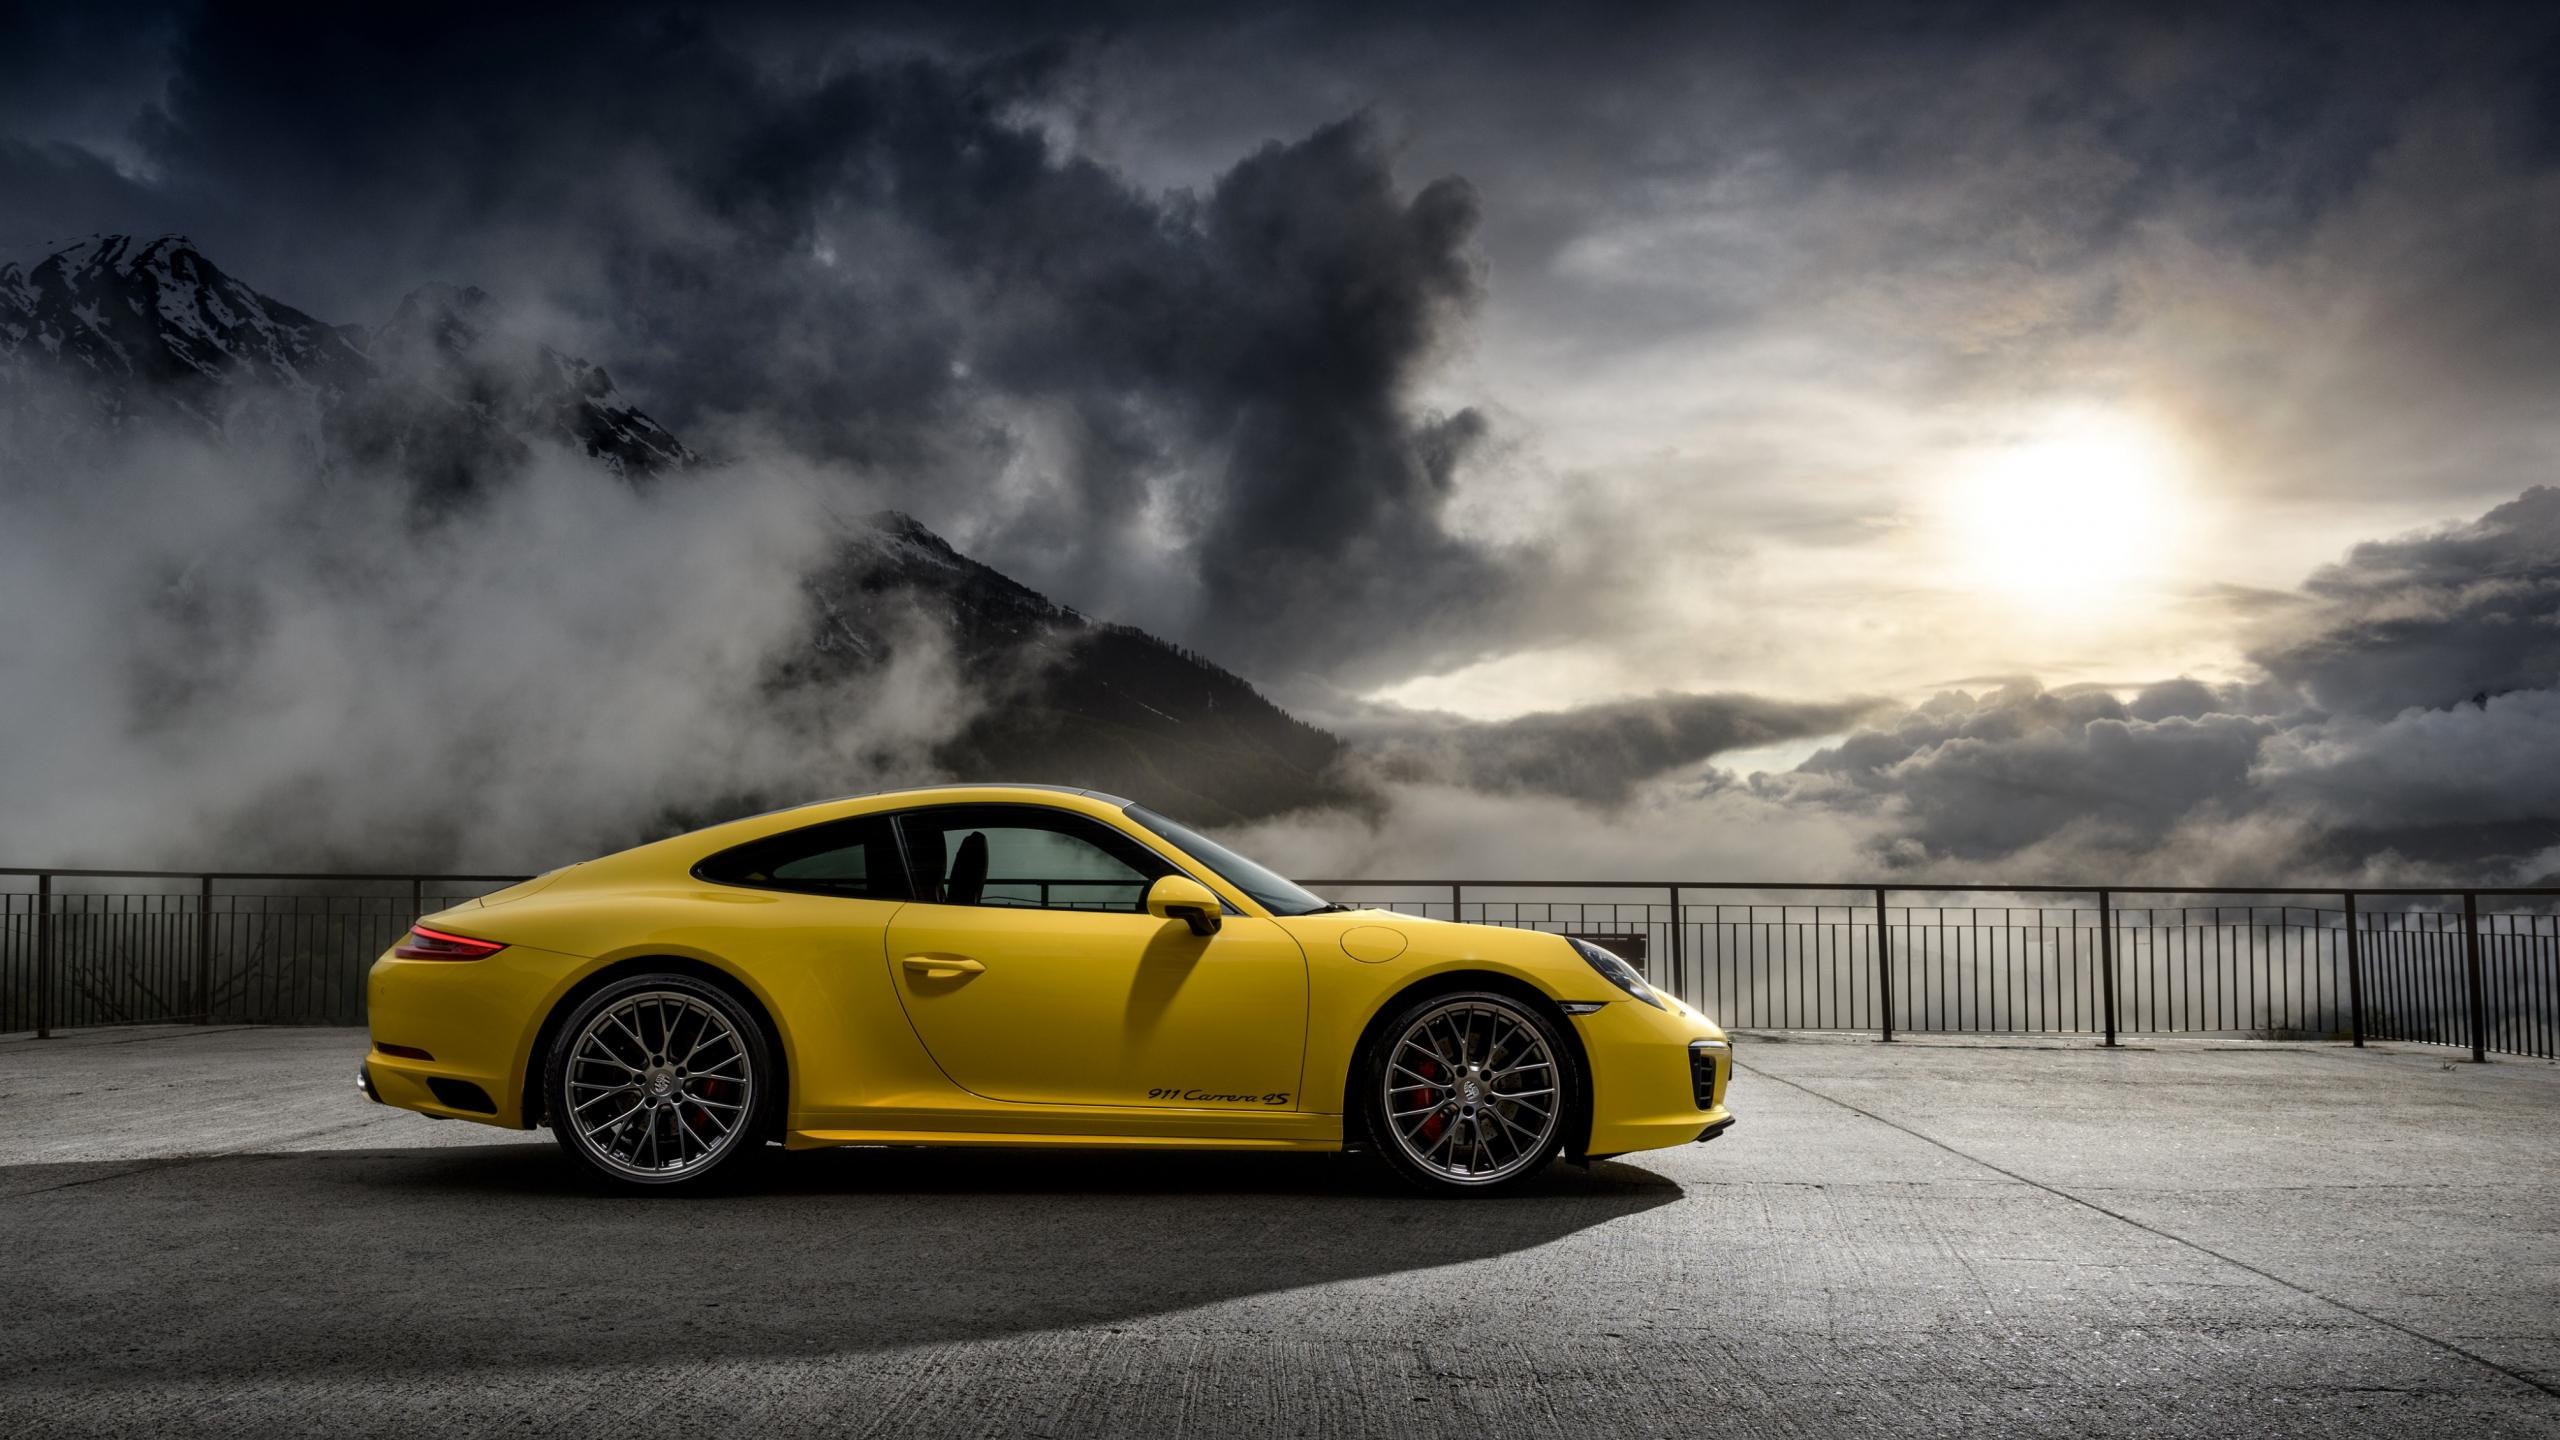 Desktop Wallpaper Porsche 911 Carrera 4 S Yellow Sports Car 4k Hd Image Picture Background 1d0a8d